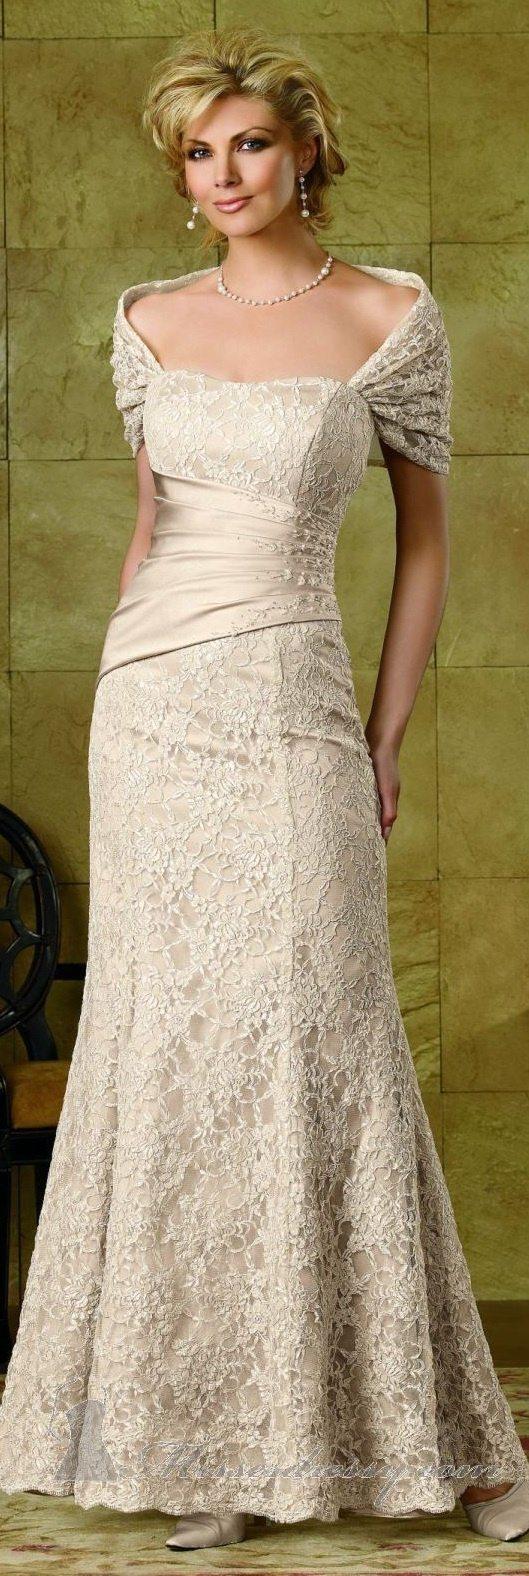 5fe1efbcd2 Beautiful Wedding Gowns For Older Brides - Gomes Weine AG